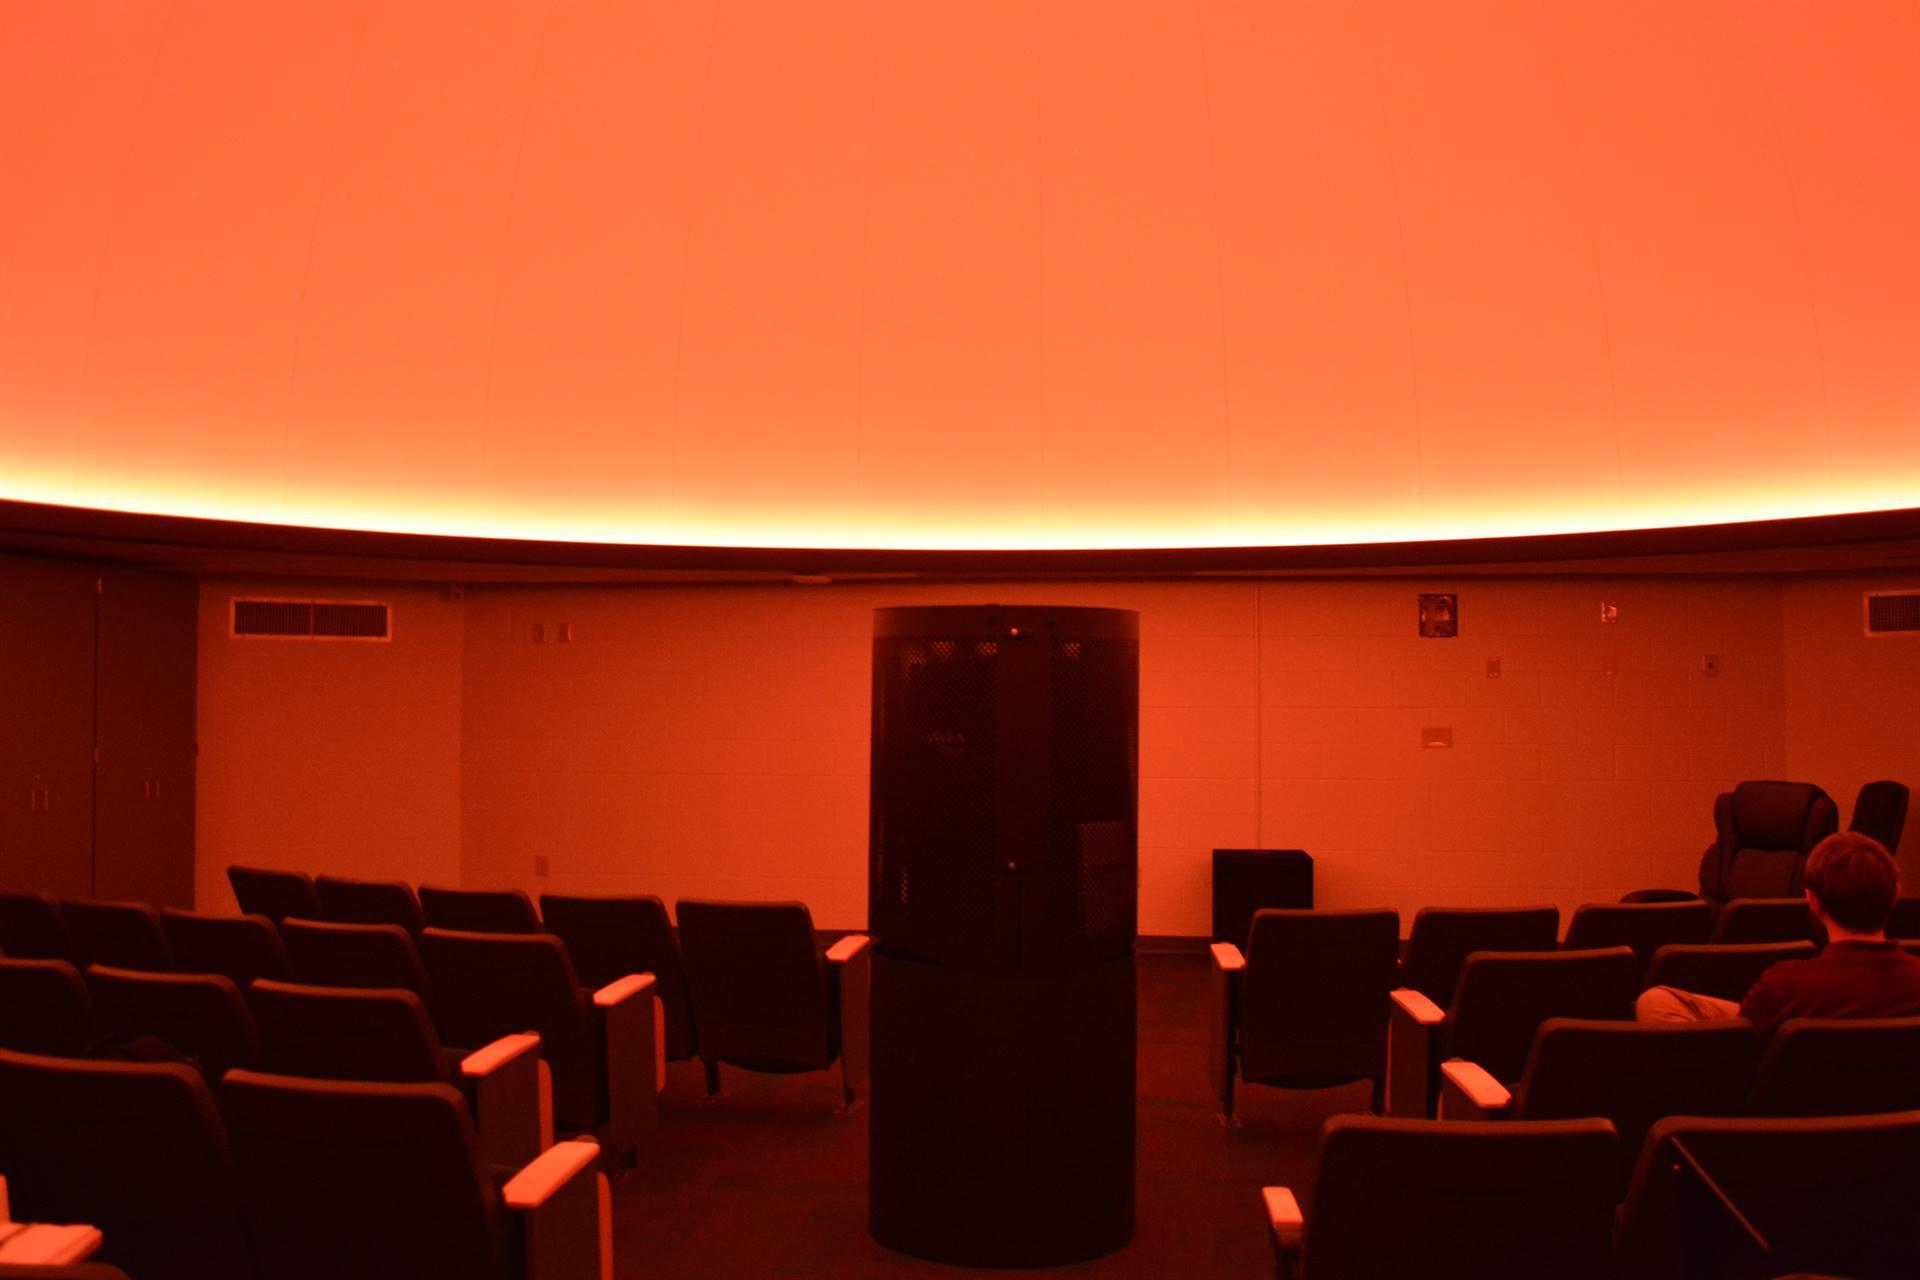 The Sidney Frohman Planetarium